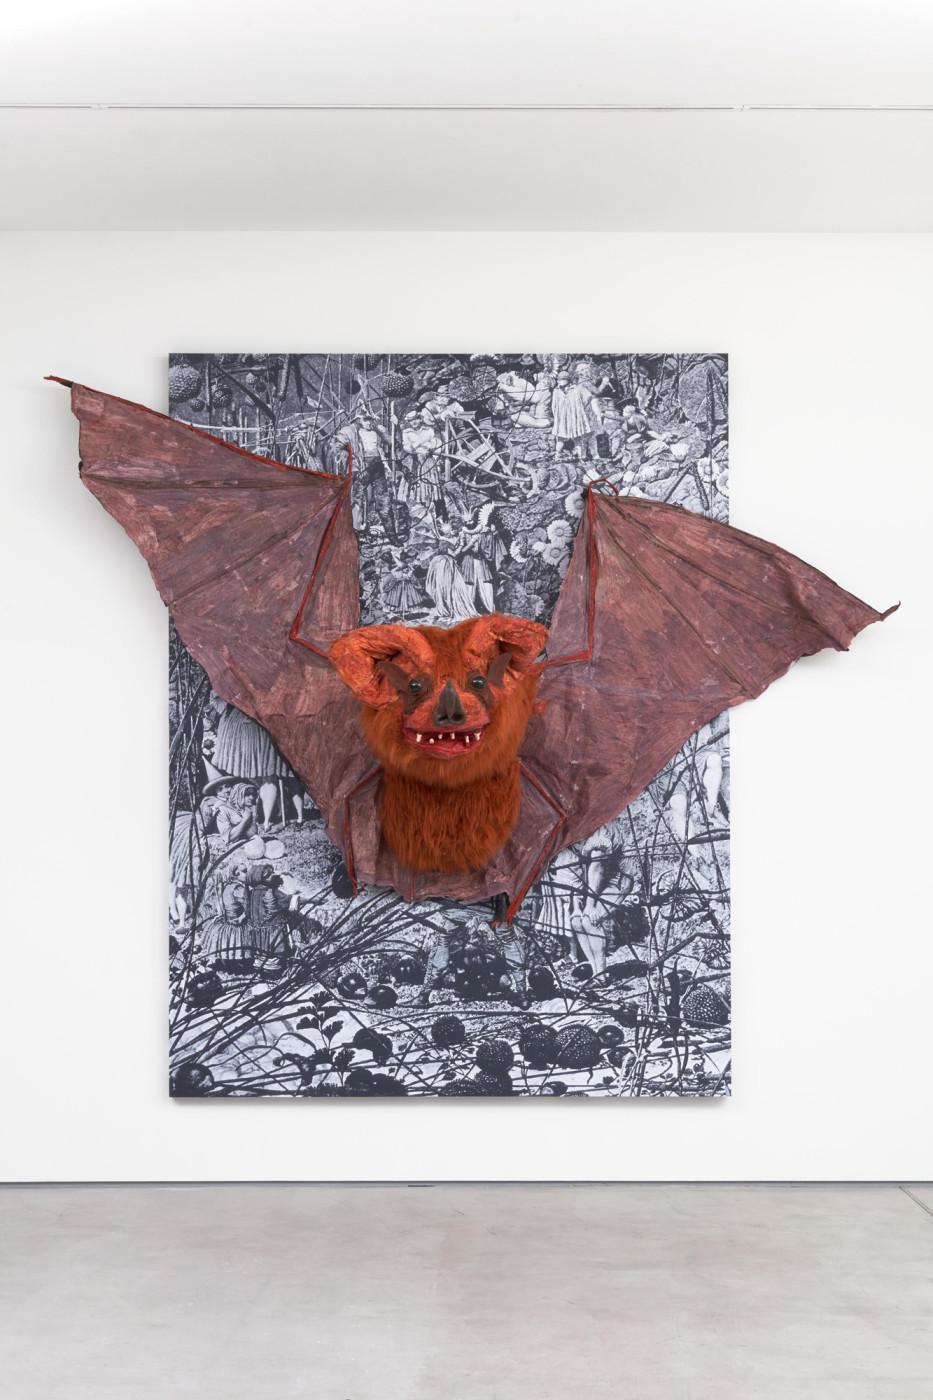 "<div class=""artwork_caption""><div class=""title""><em>Bat</em>, 2018</div><div class=""medium"">photocopies, wood, latex, fabric, paint</div><div class=""dimensions"">280 x 319 x 106 cm</div><div class=""dimensions"">110 ¼ x 125 ⅝ x 41 ¾ in.</div></div>"